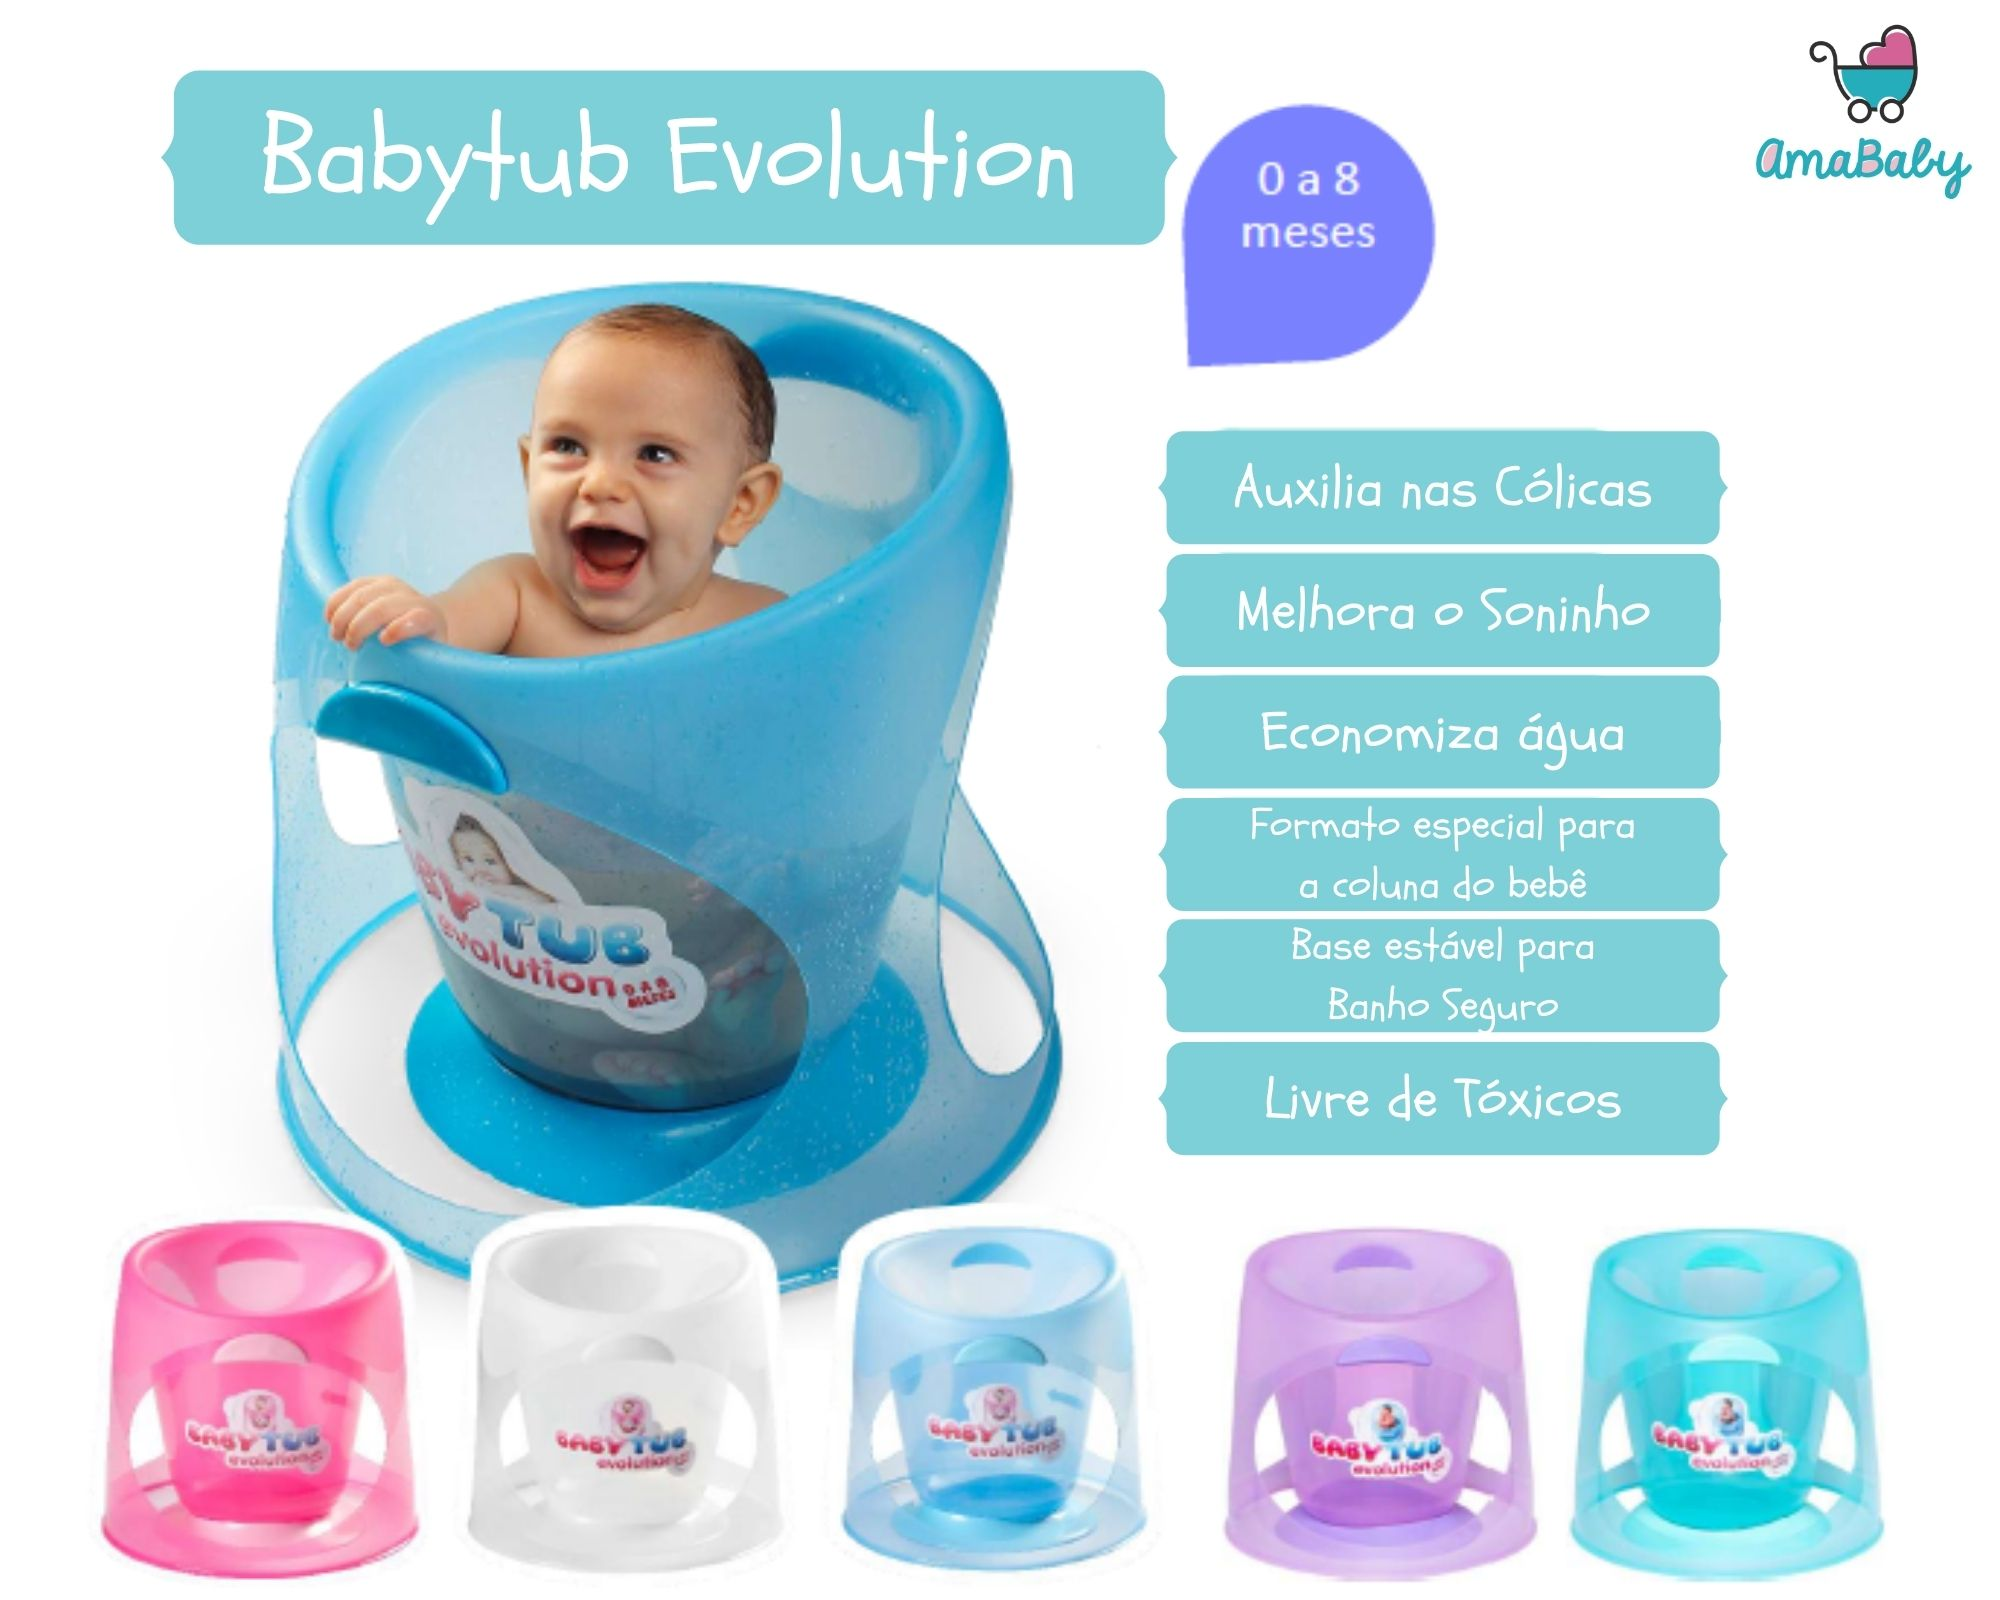 Banheira Babytub Evolution Laranja Cristal 0-8 meses